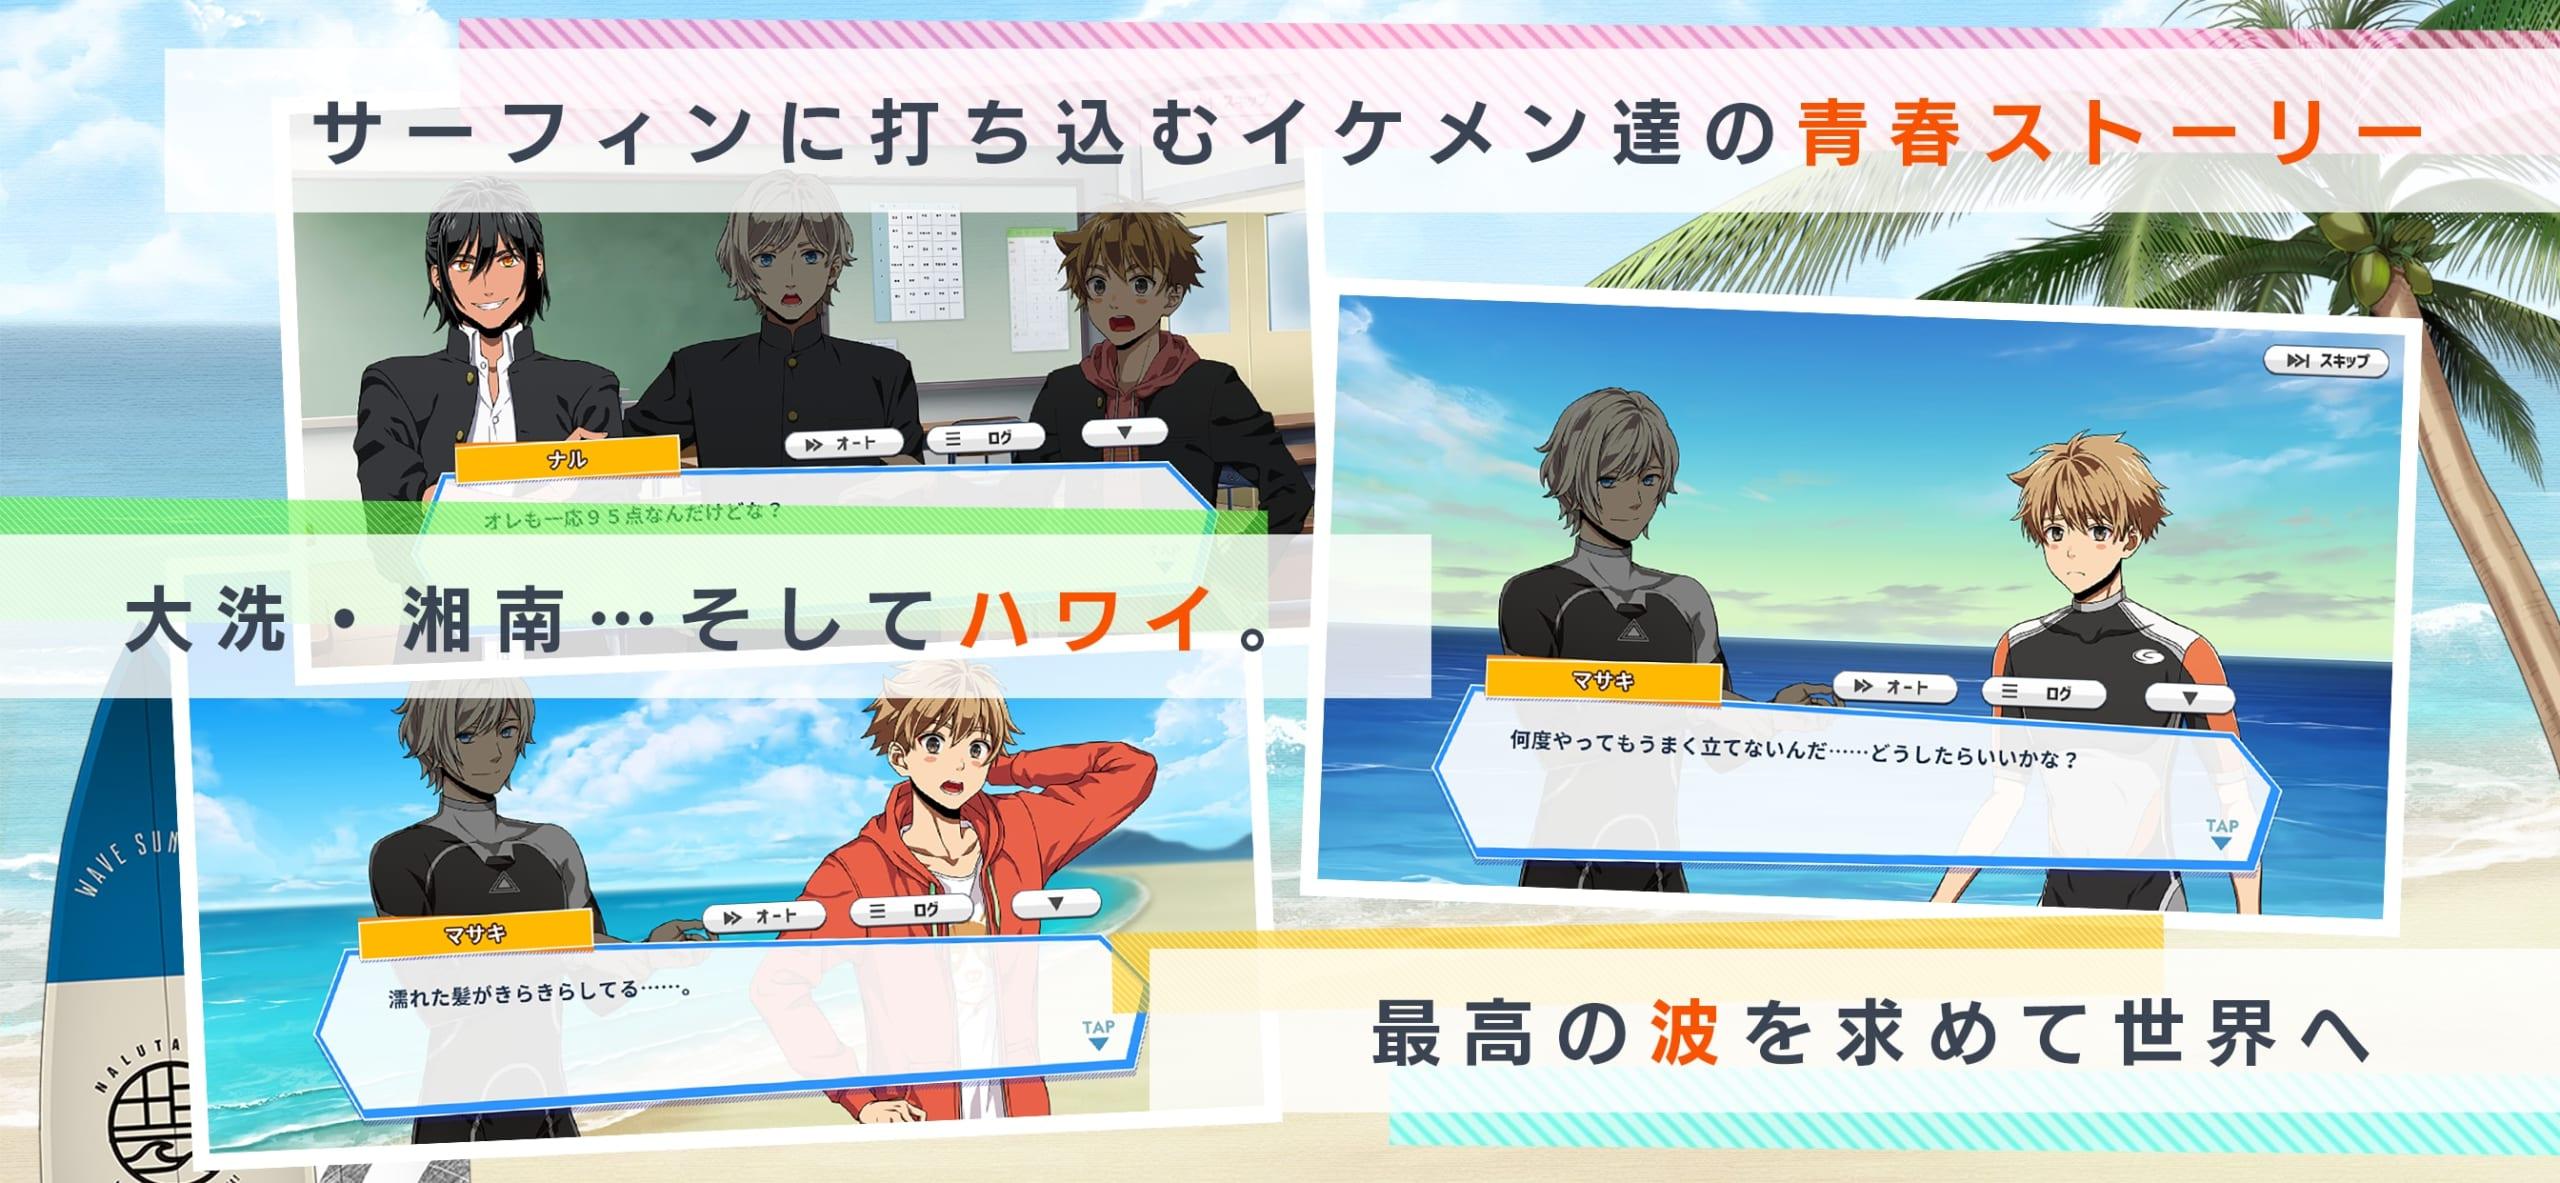 「WAVE!!〜波乗りボーイズ〜」ゲーム画面3